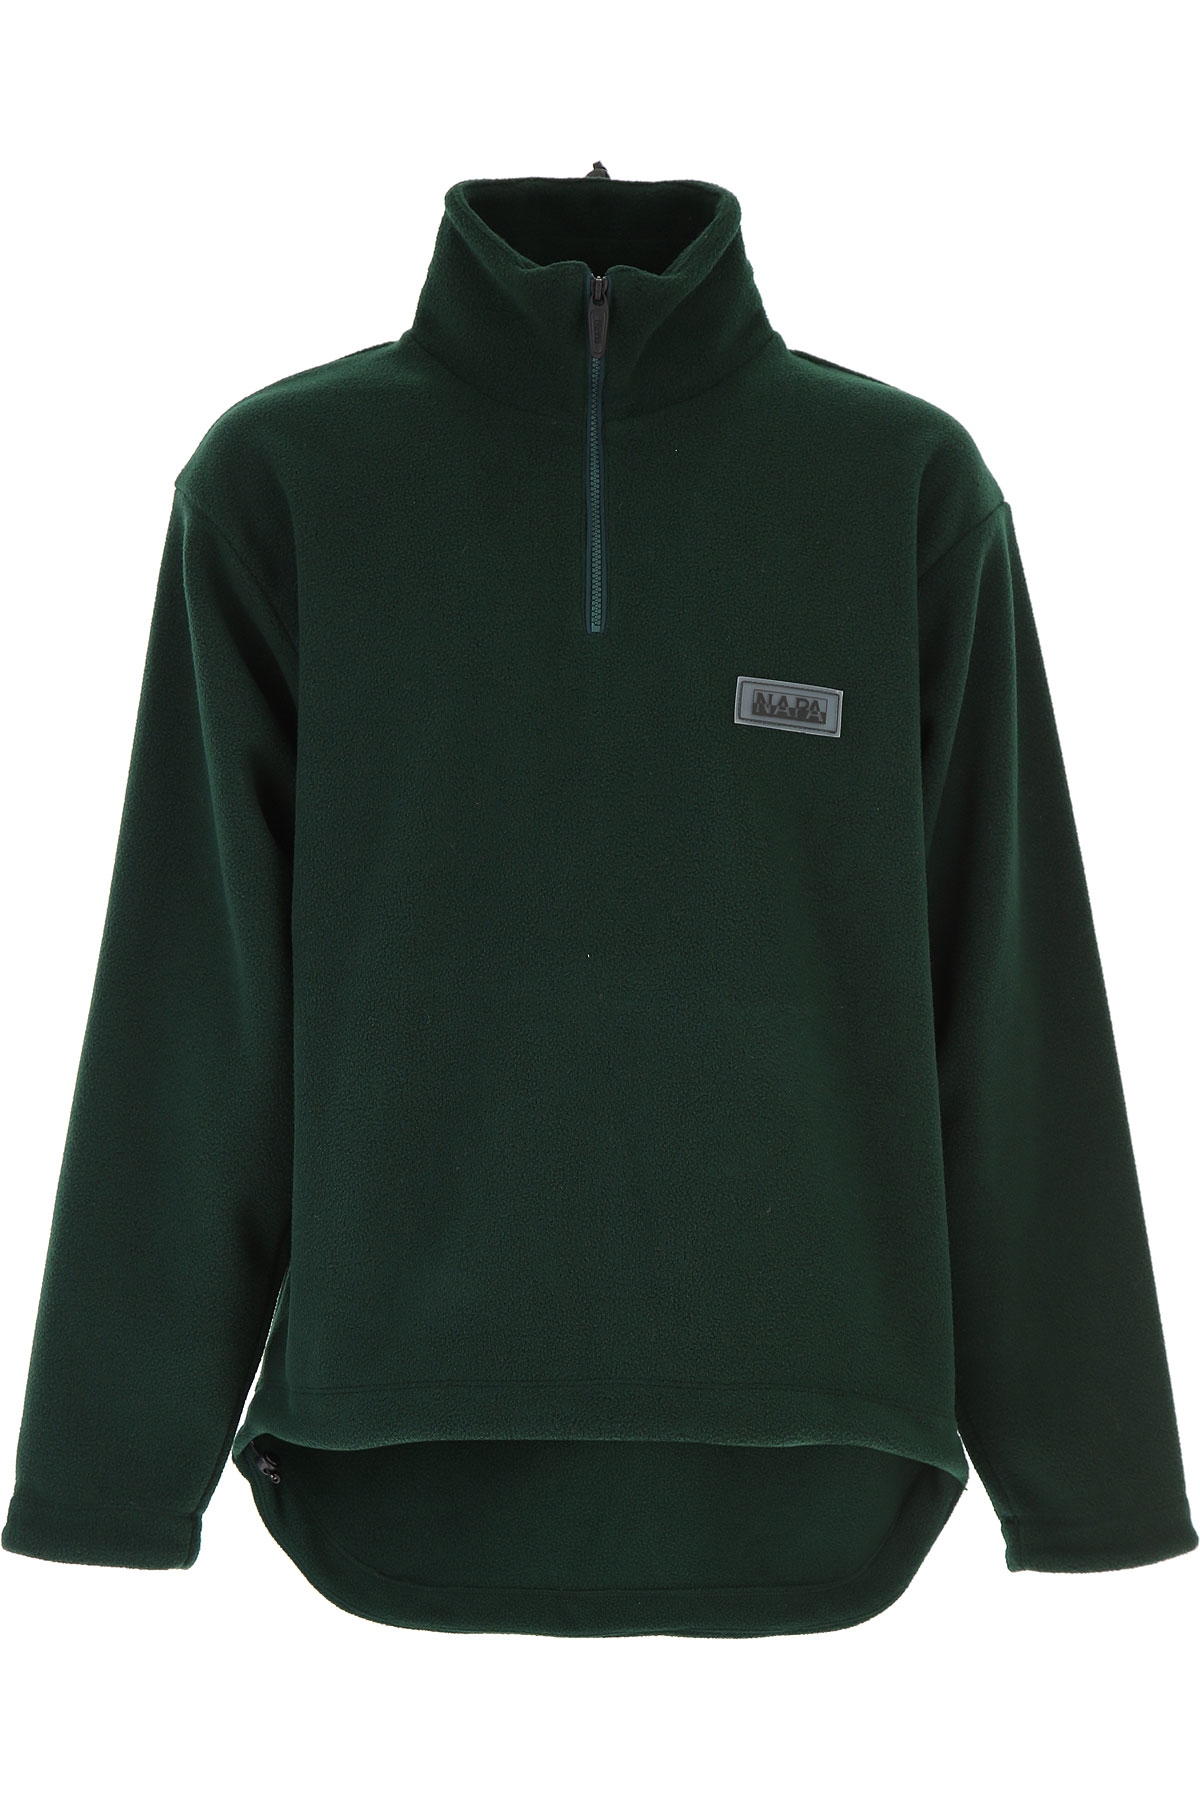 Image of Napapijri Sweater for Men Jumper, Dark Green, Wool, 2017, L M S XL